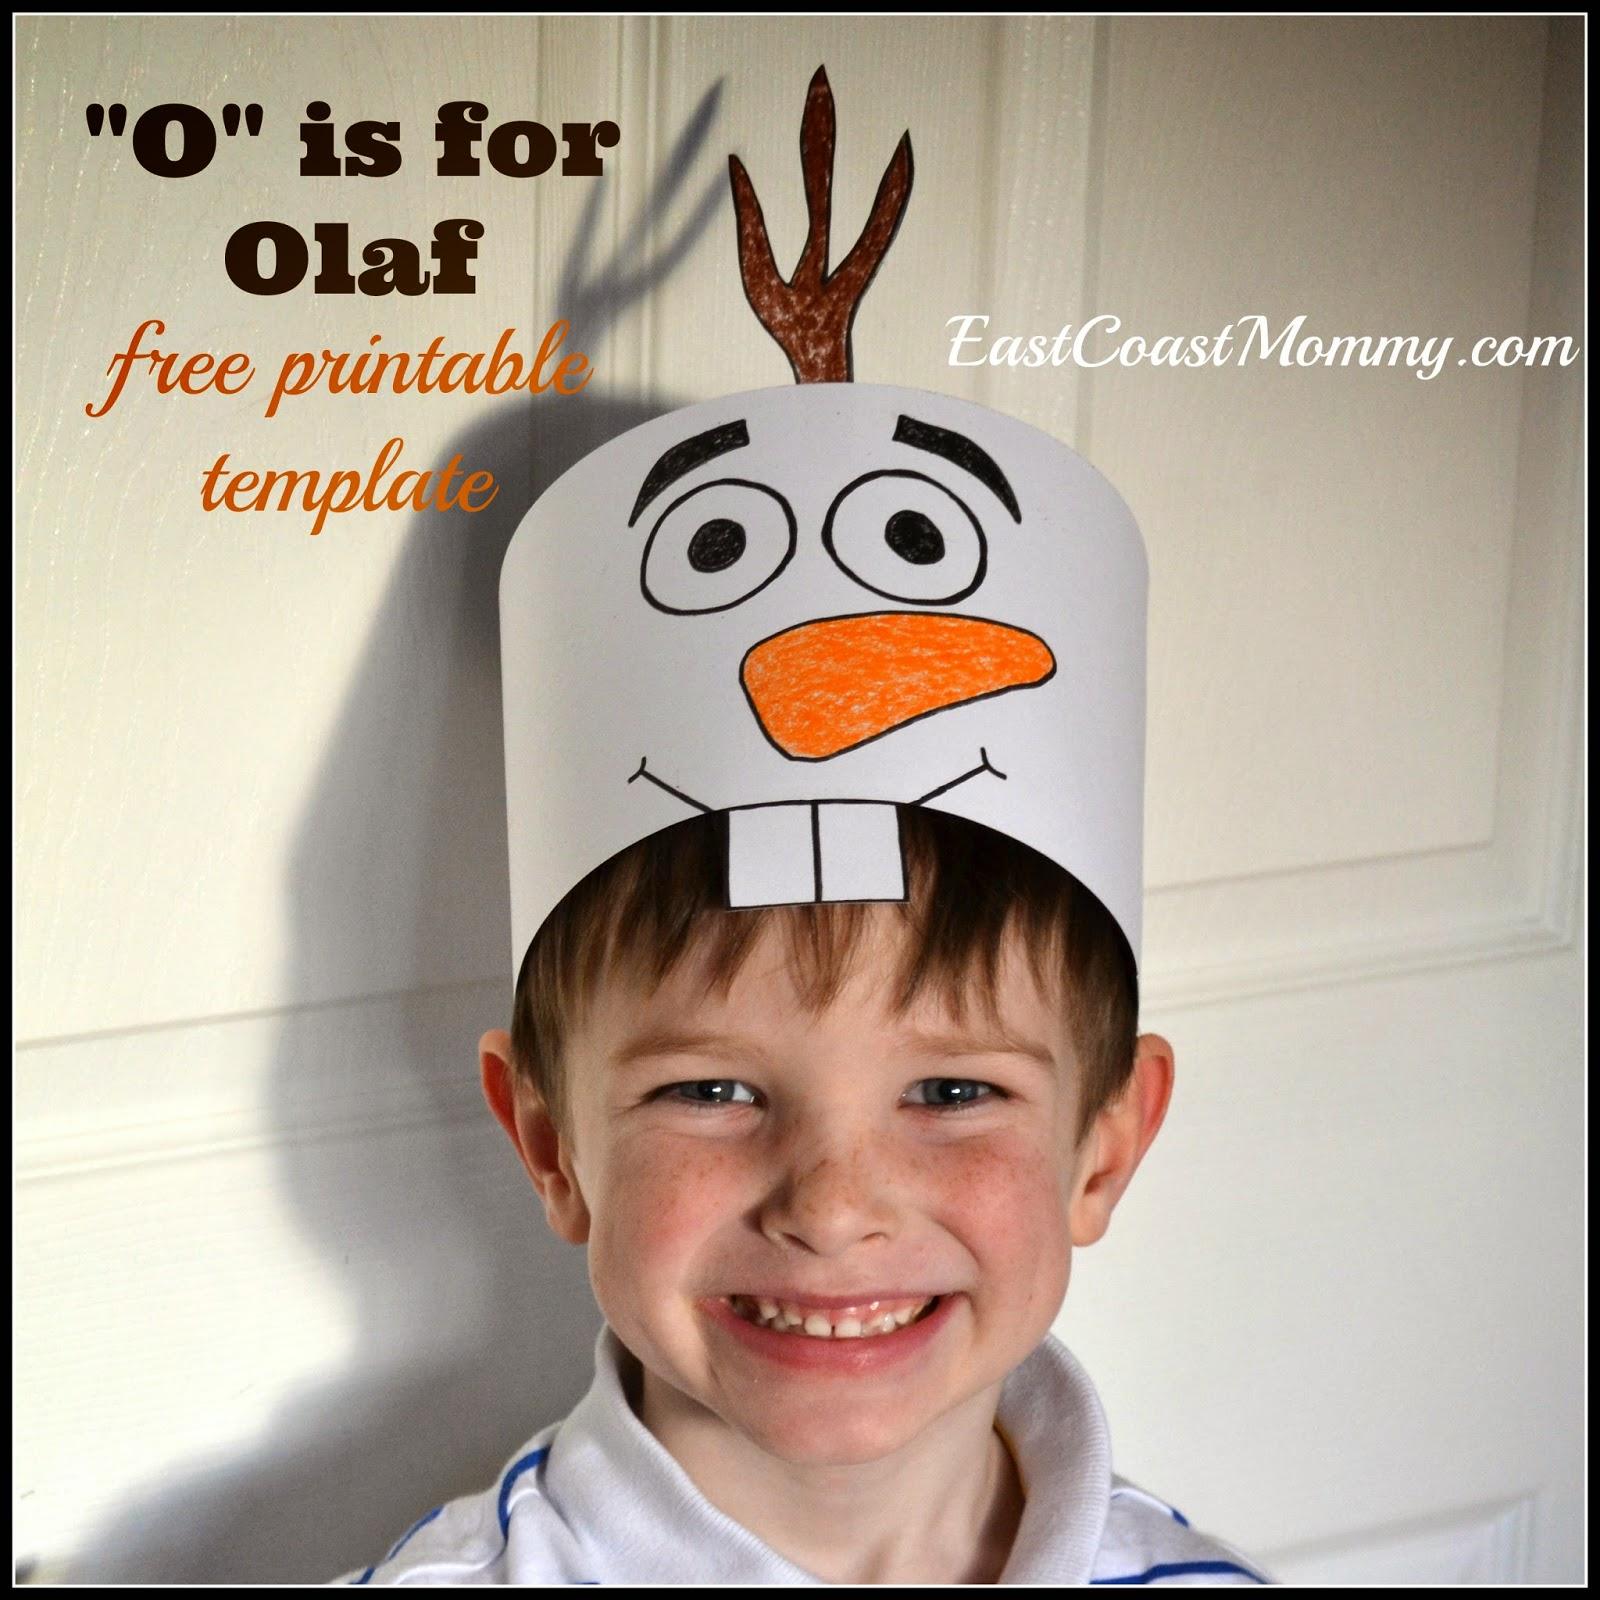 East Coast Mommy Olaf Hat Free Printable Template